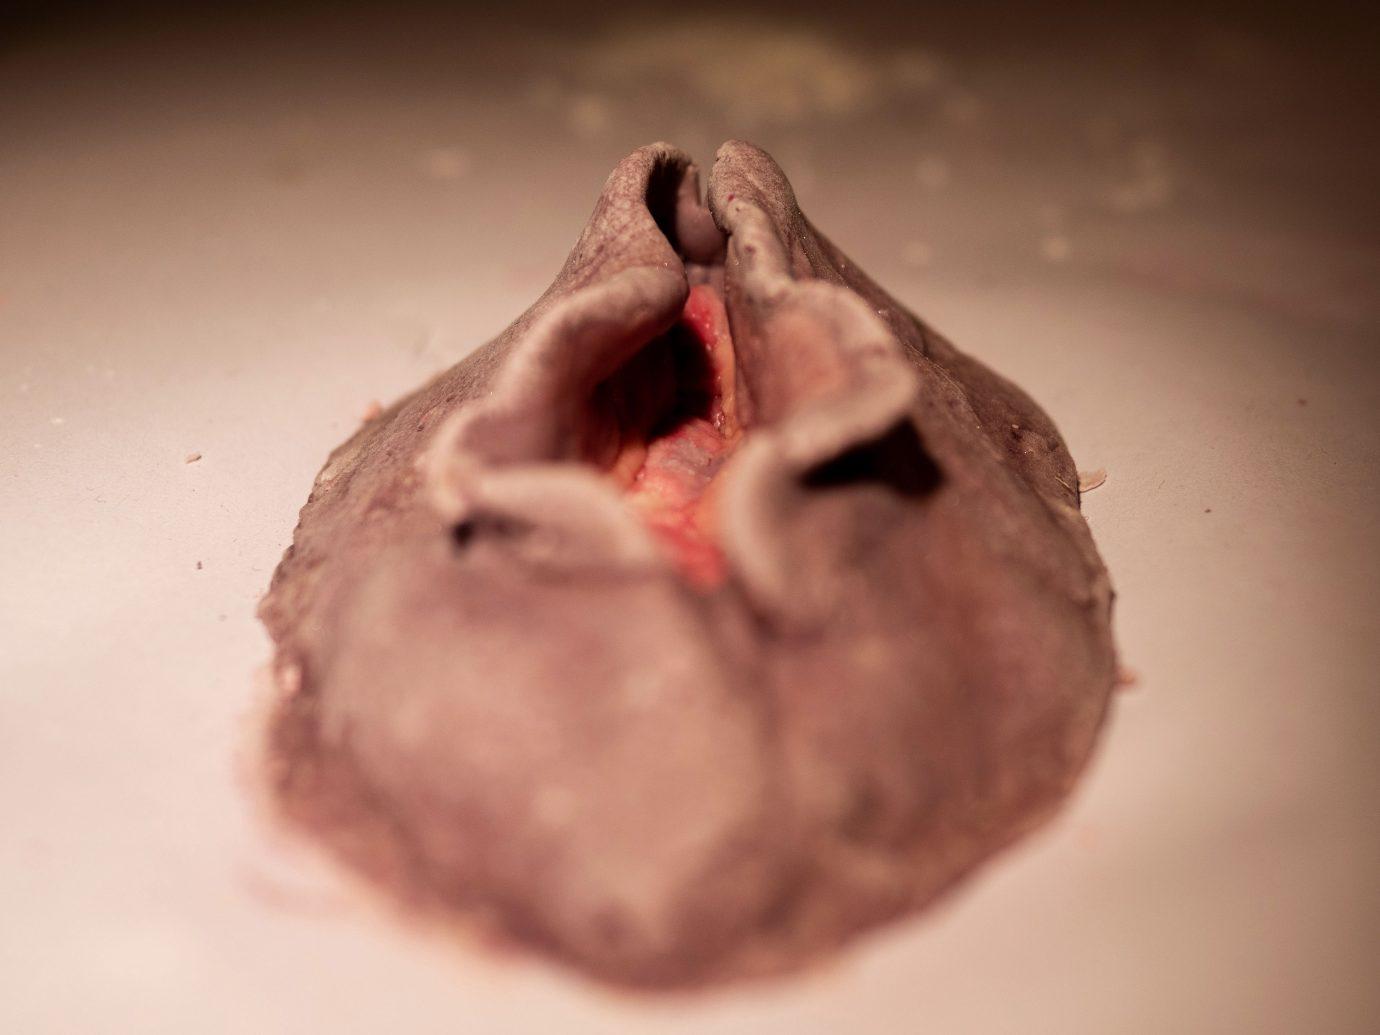 Vulva crafting